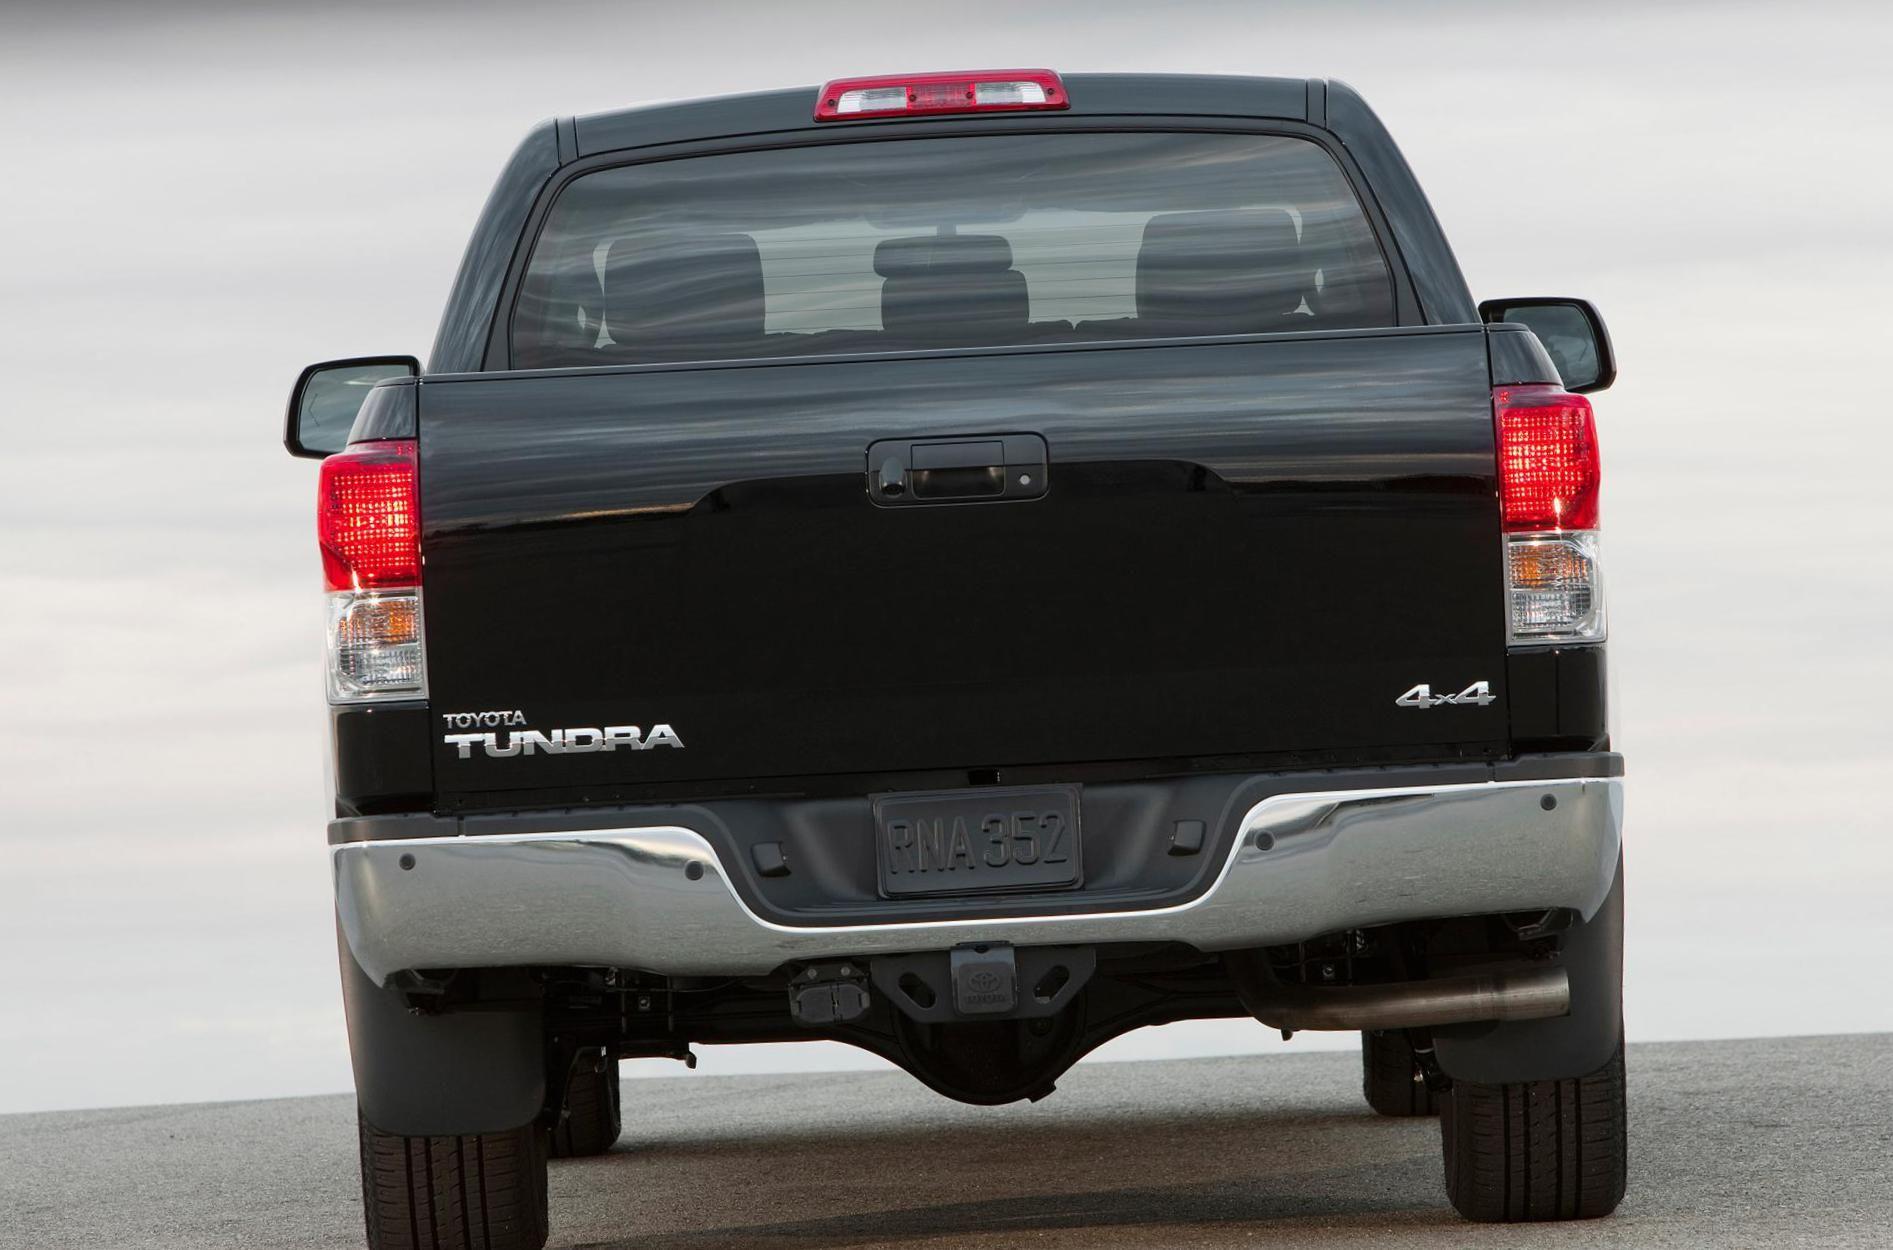 Toyota Tundra CrewMax Photos and Specs. Photo Toyota